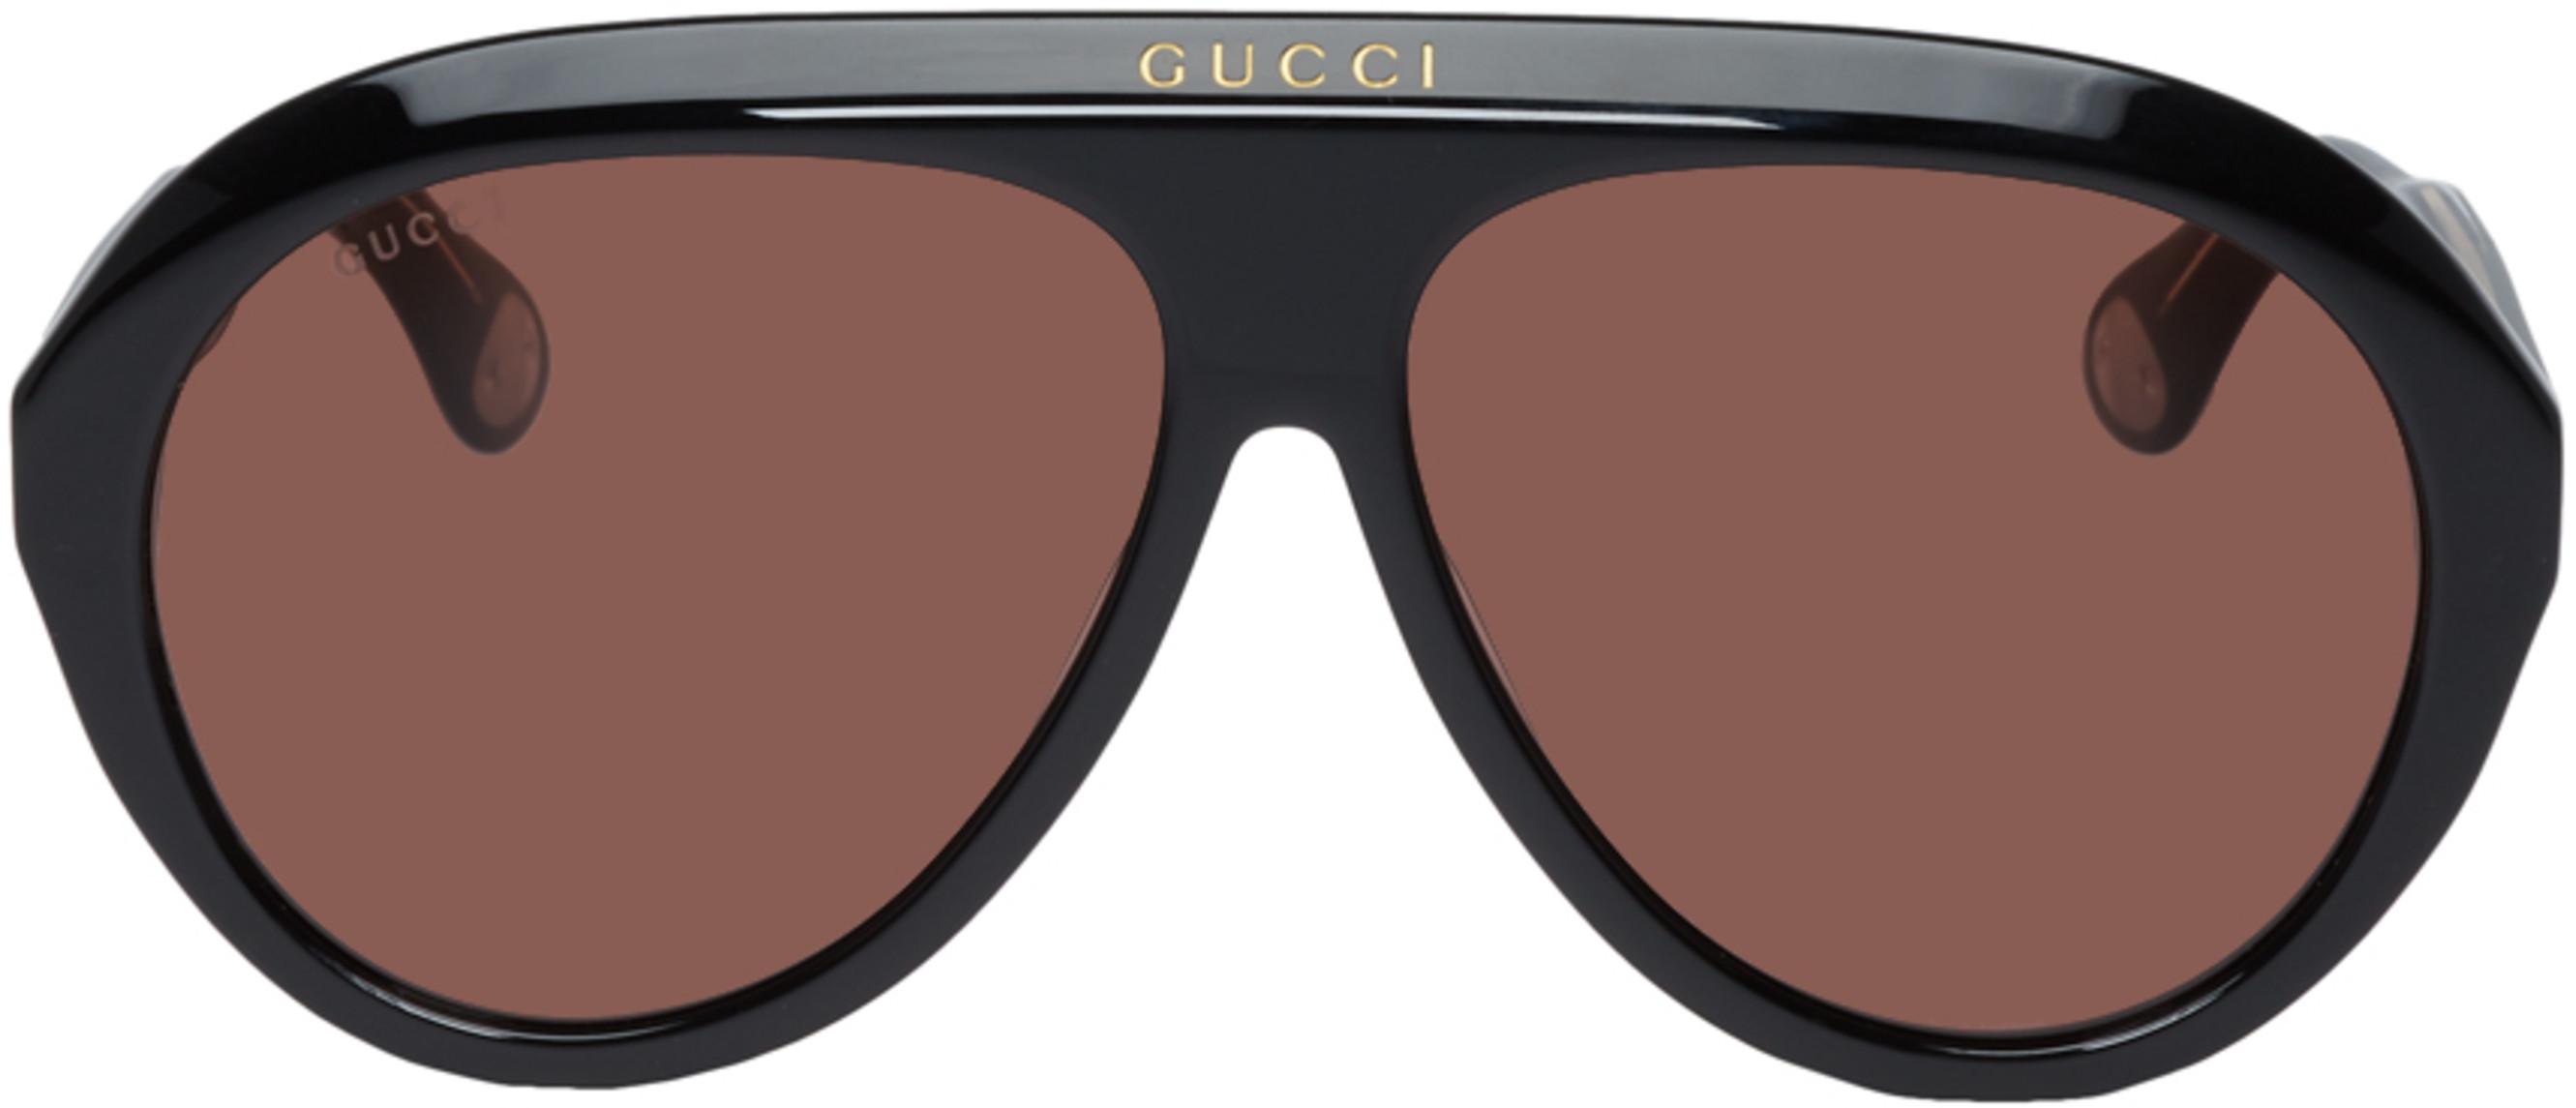 df1185c8d07 Gucci eyewear for Men